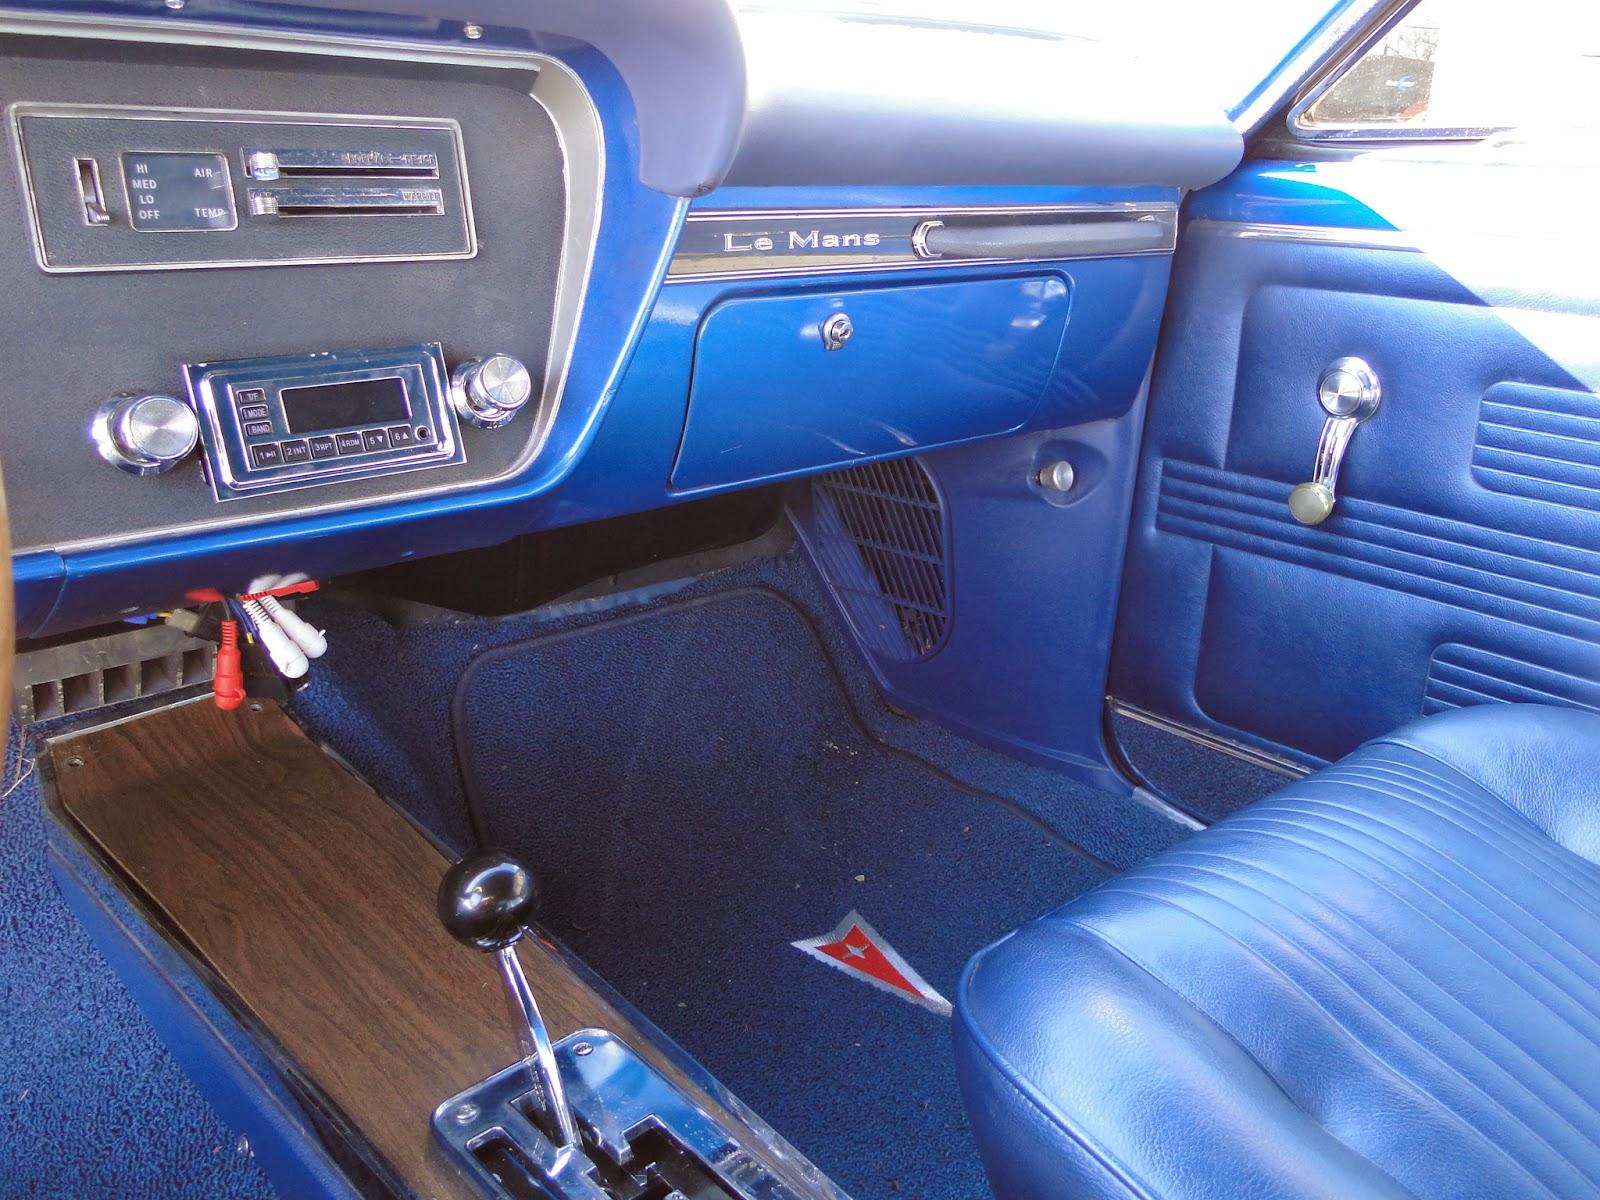 Pontiac Lemans Interior Cabin on Dodge Ram 2500 Truck